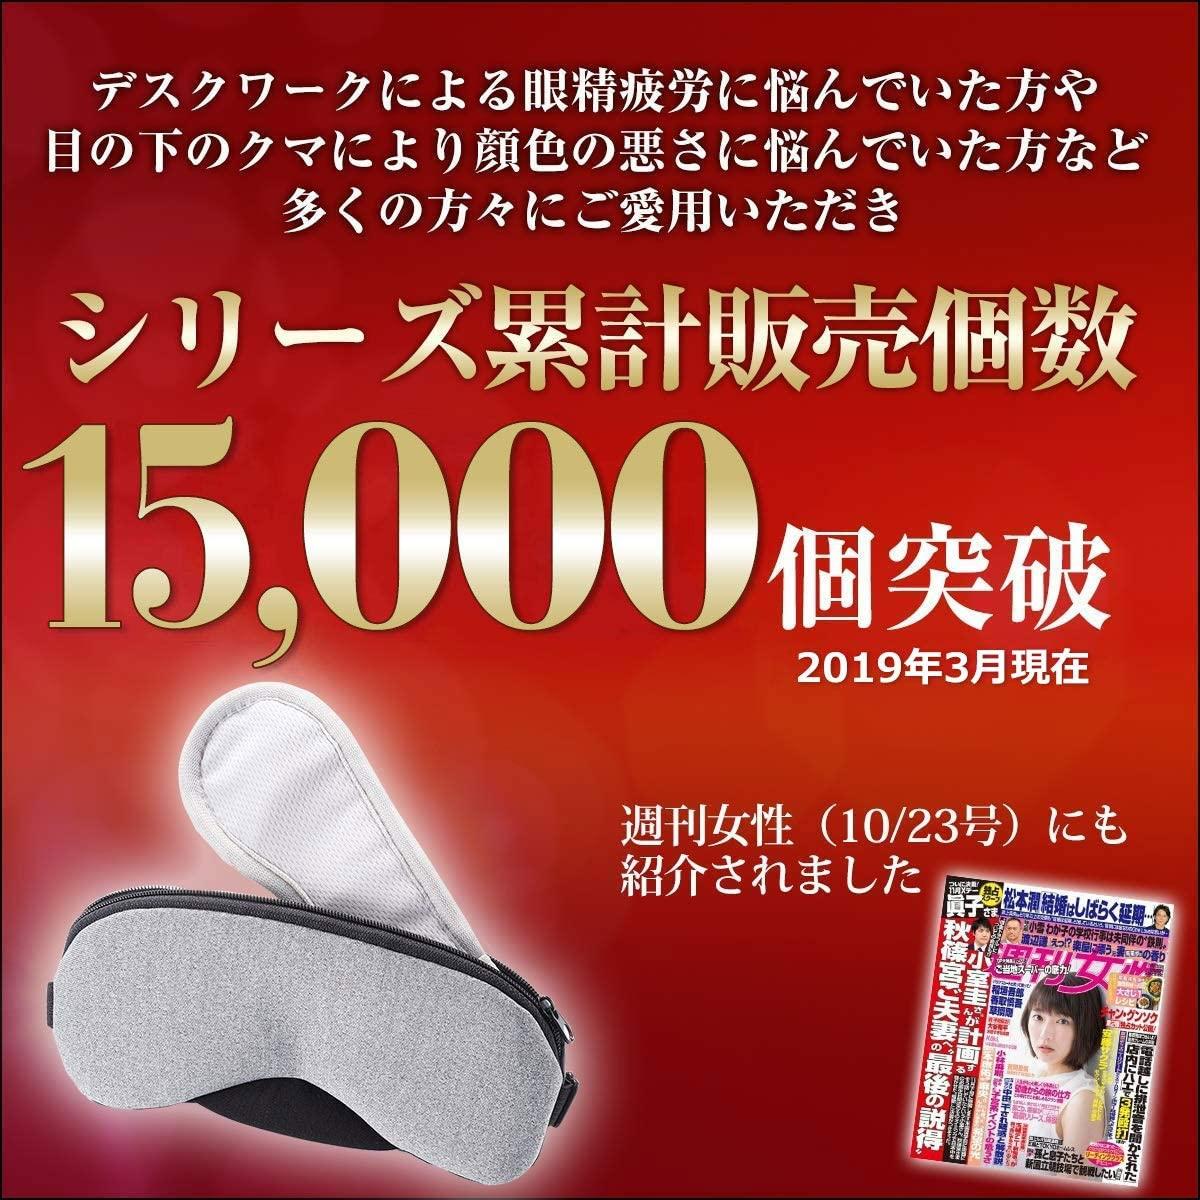 You&Me ホットアイマスク USBアイマスクの商品画像3